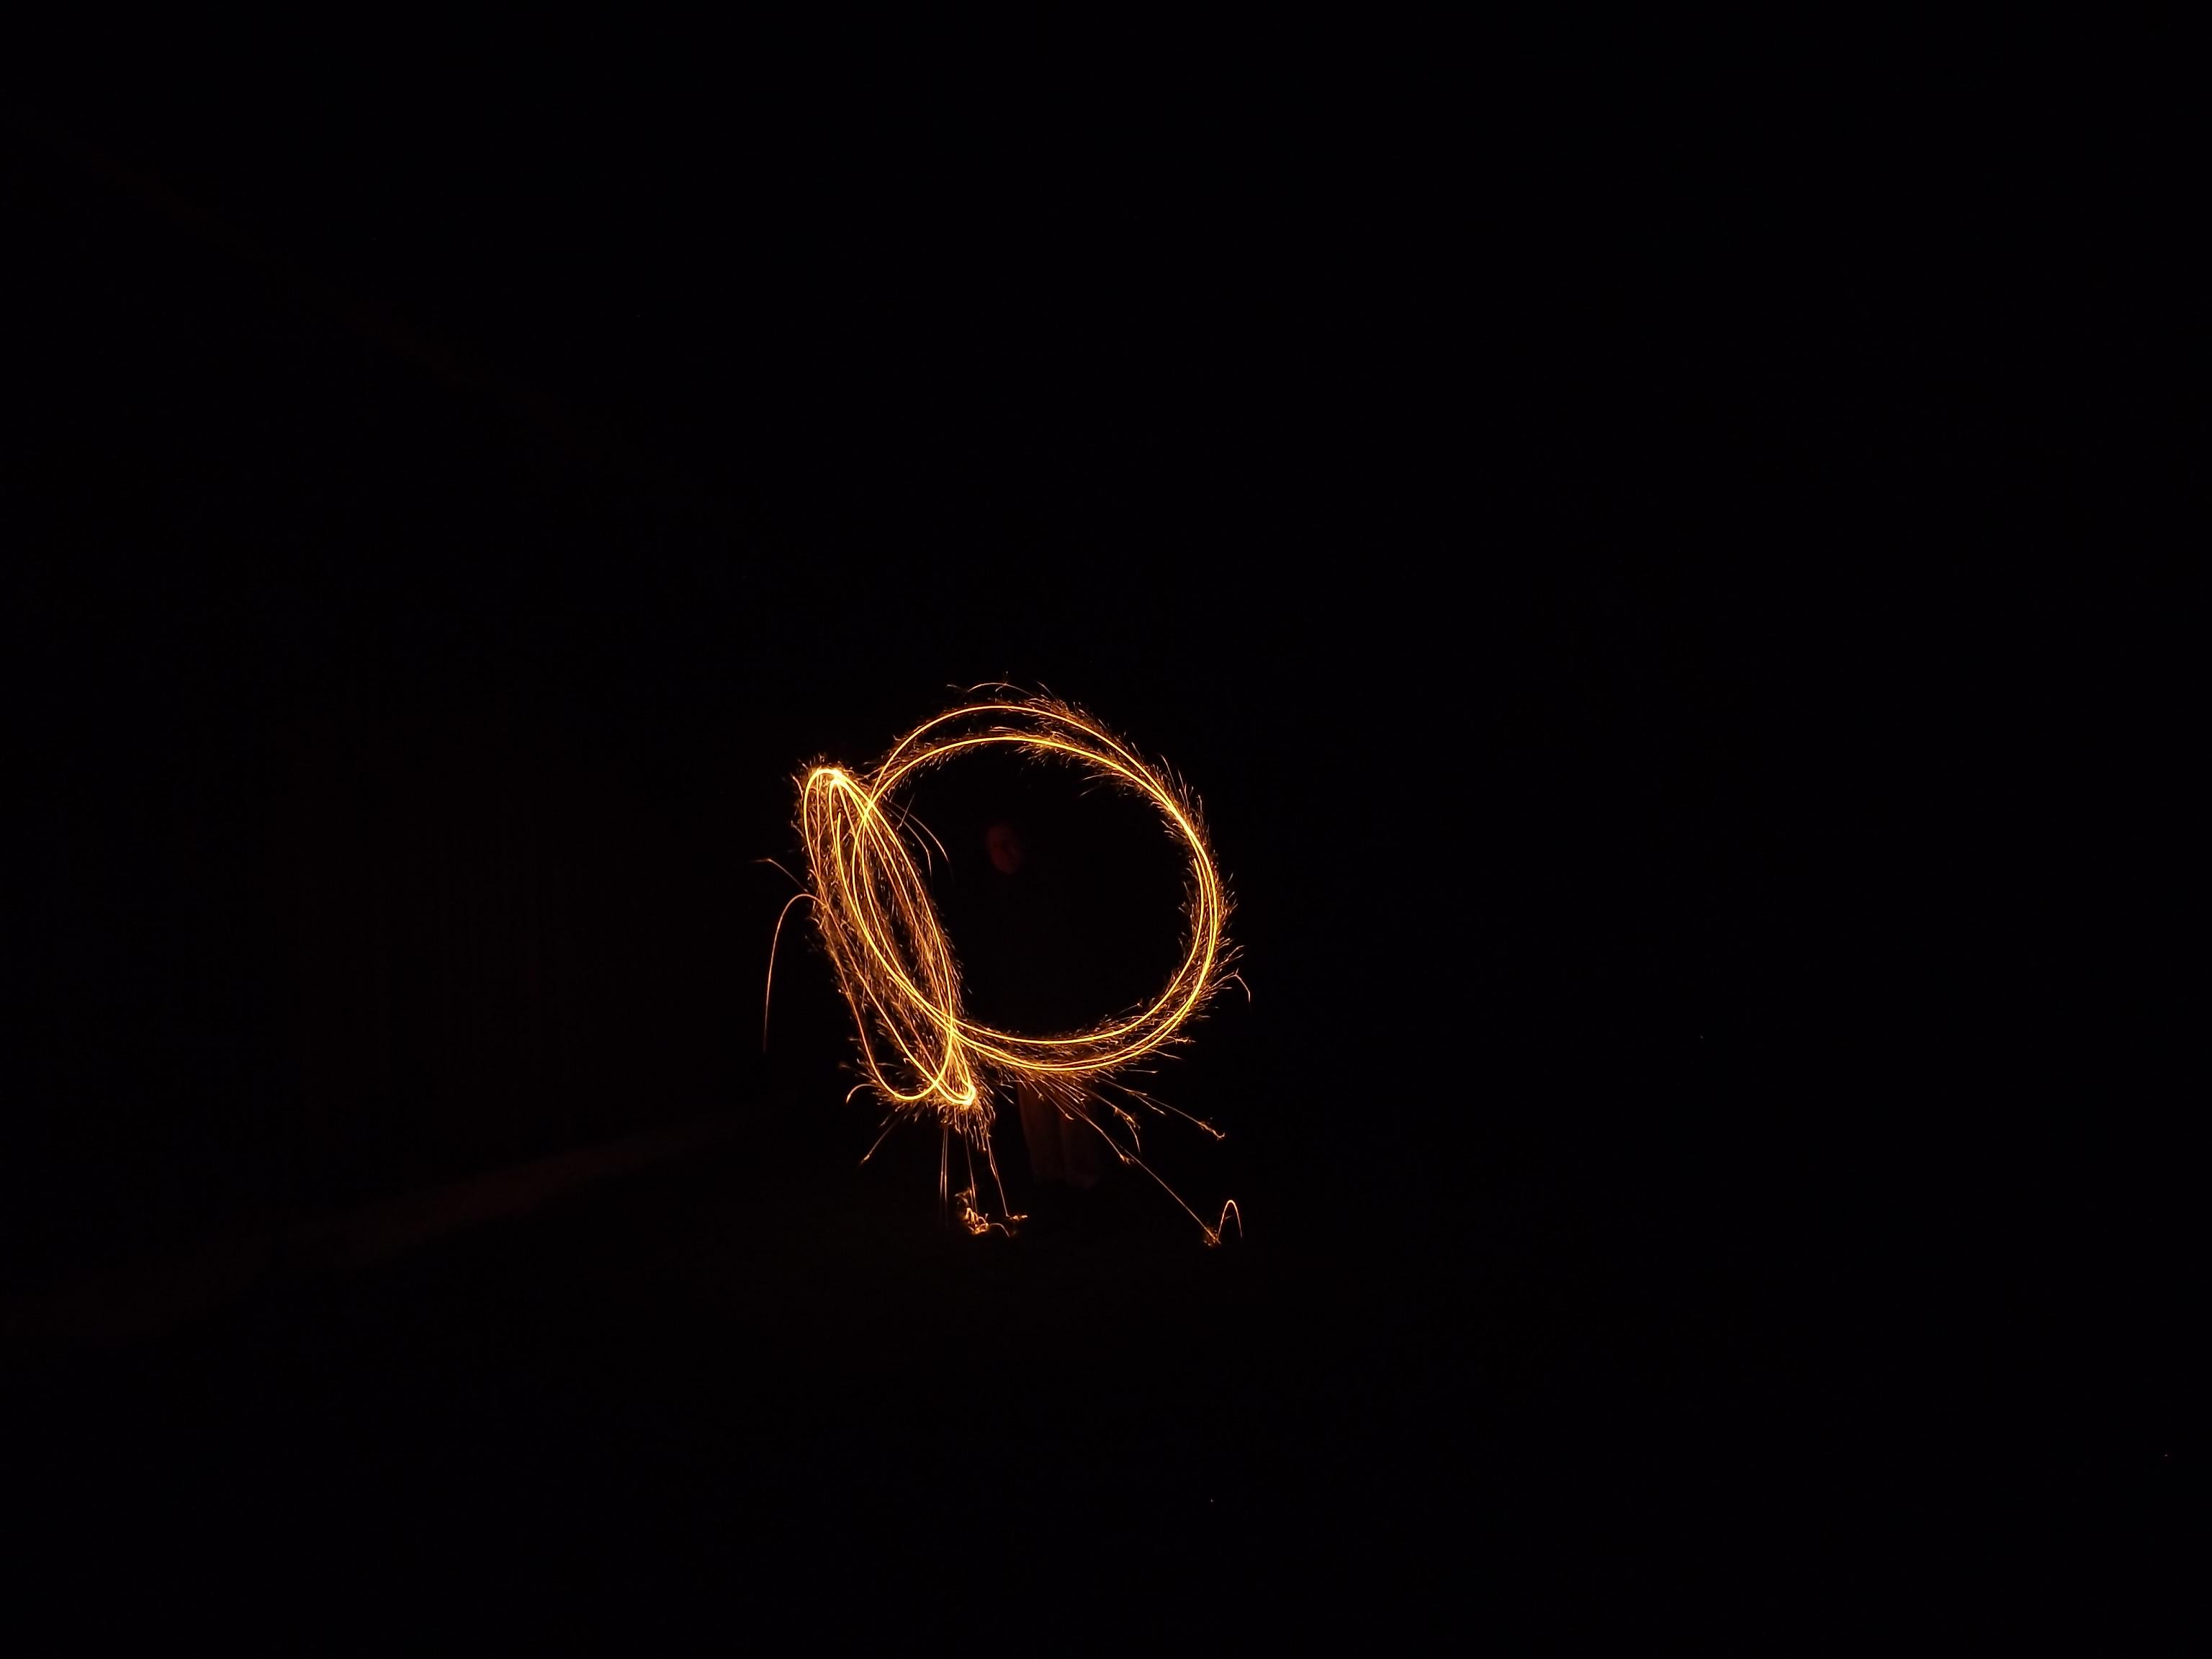 4570-feuer-ring-wirbel